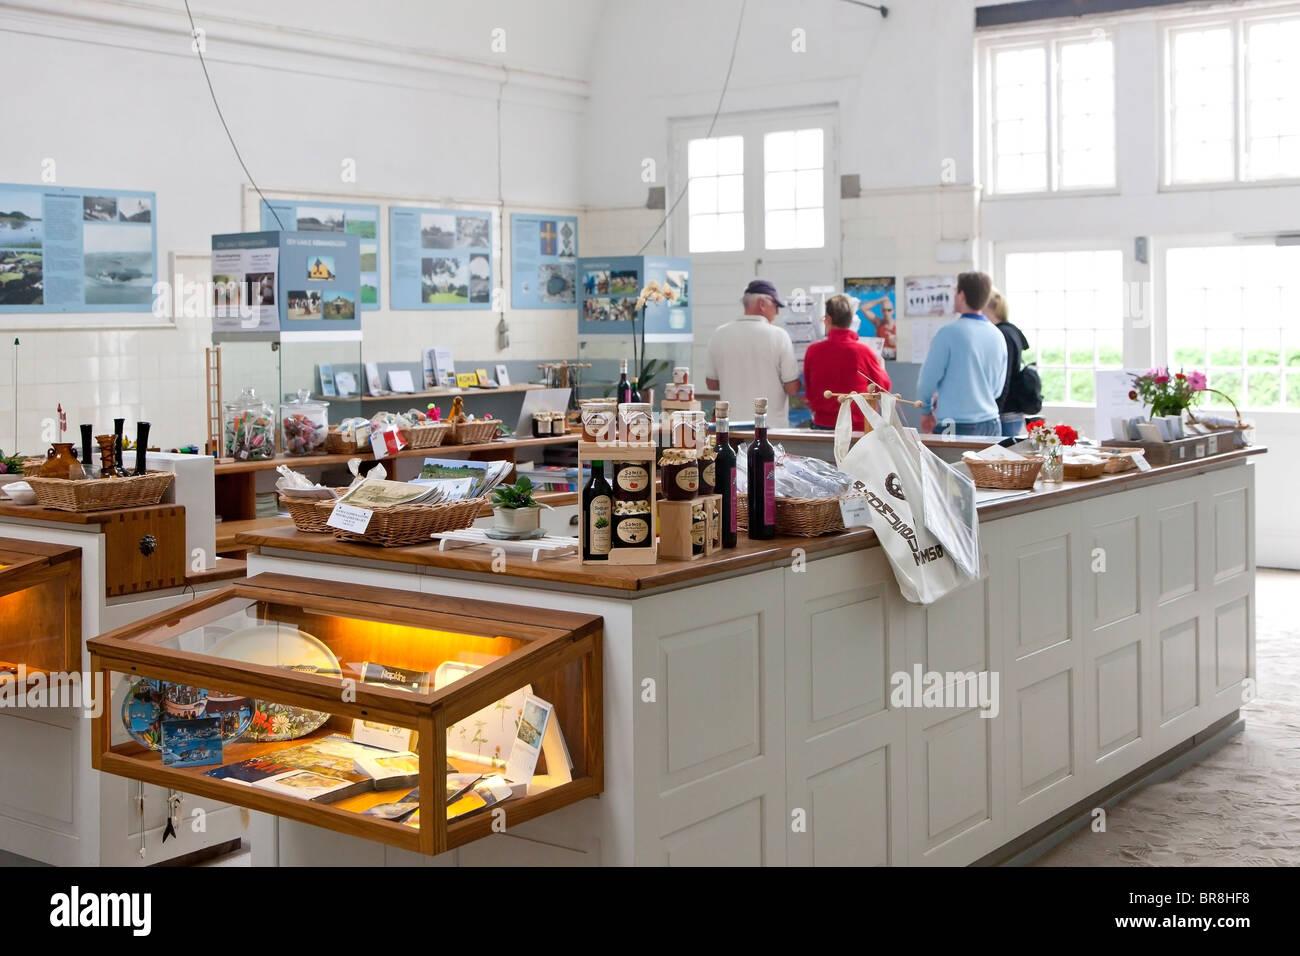 Inside the Welcome Centre at Tranbjerg Samsoe Denmark - Stock Image